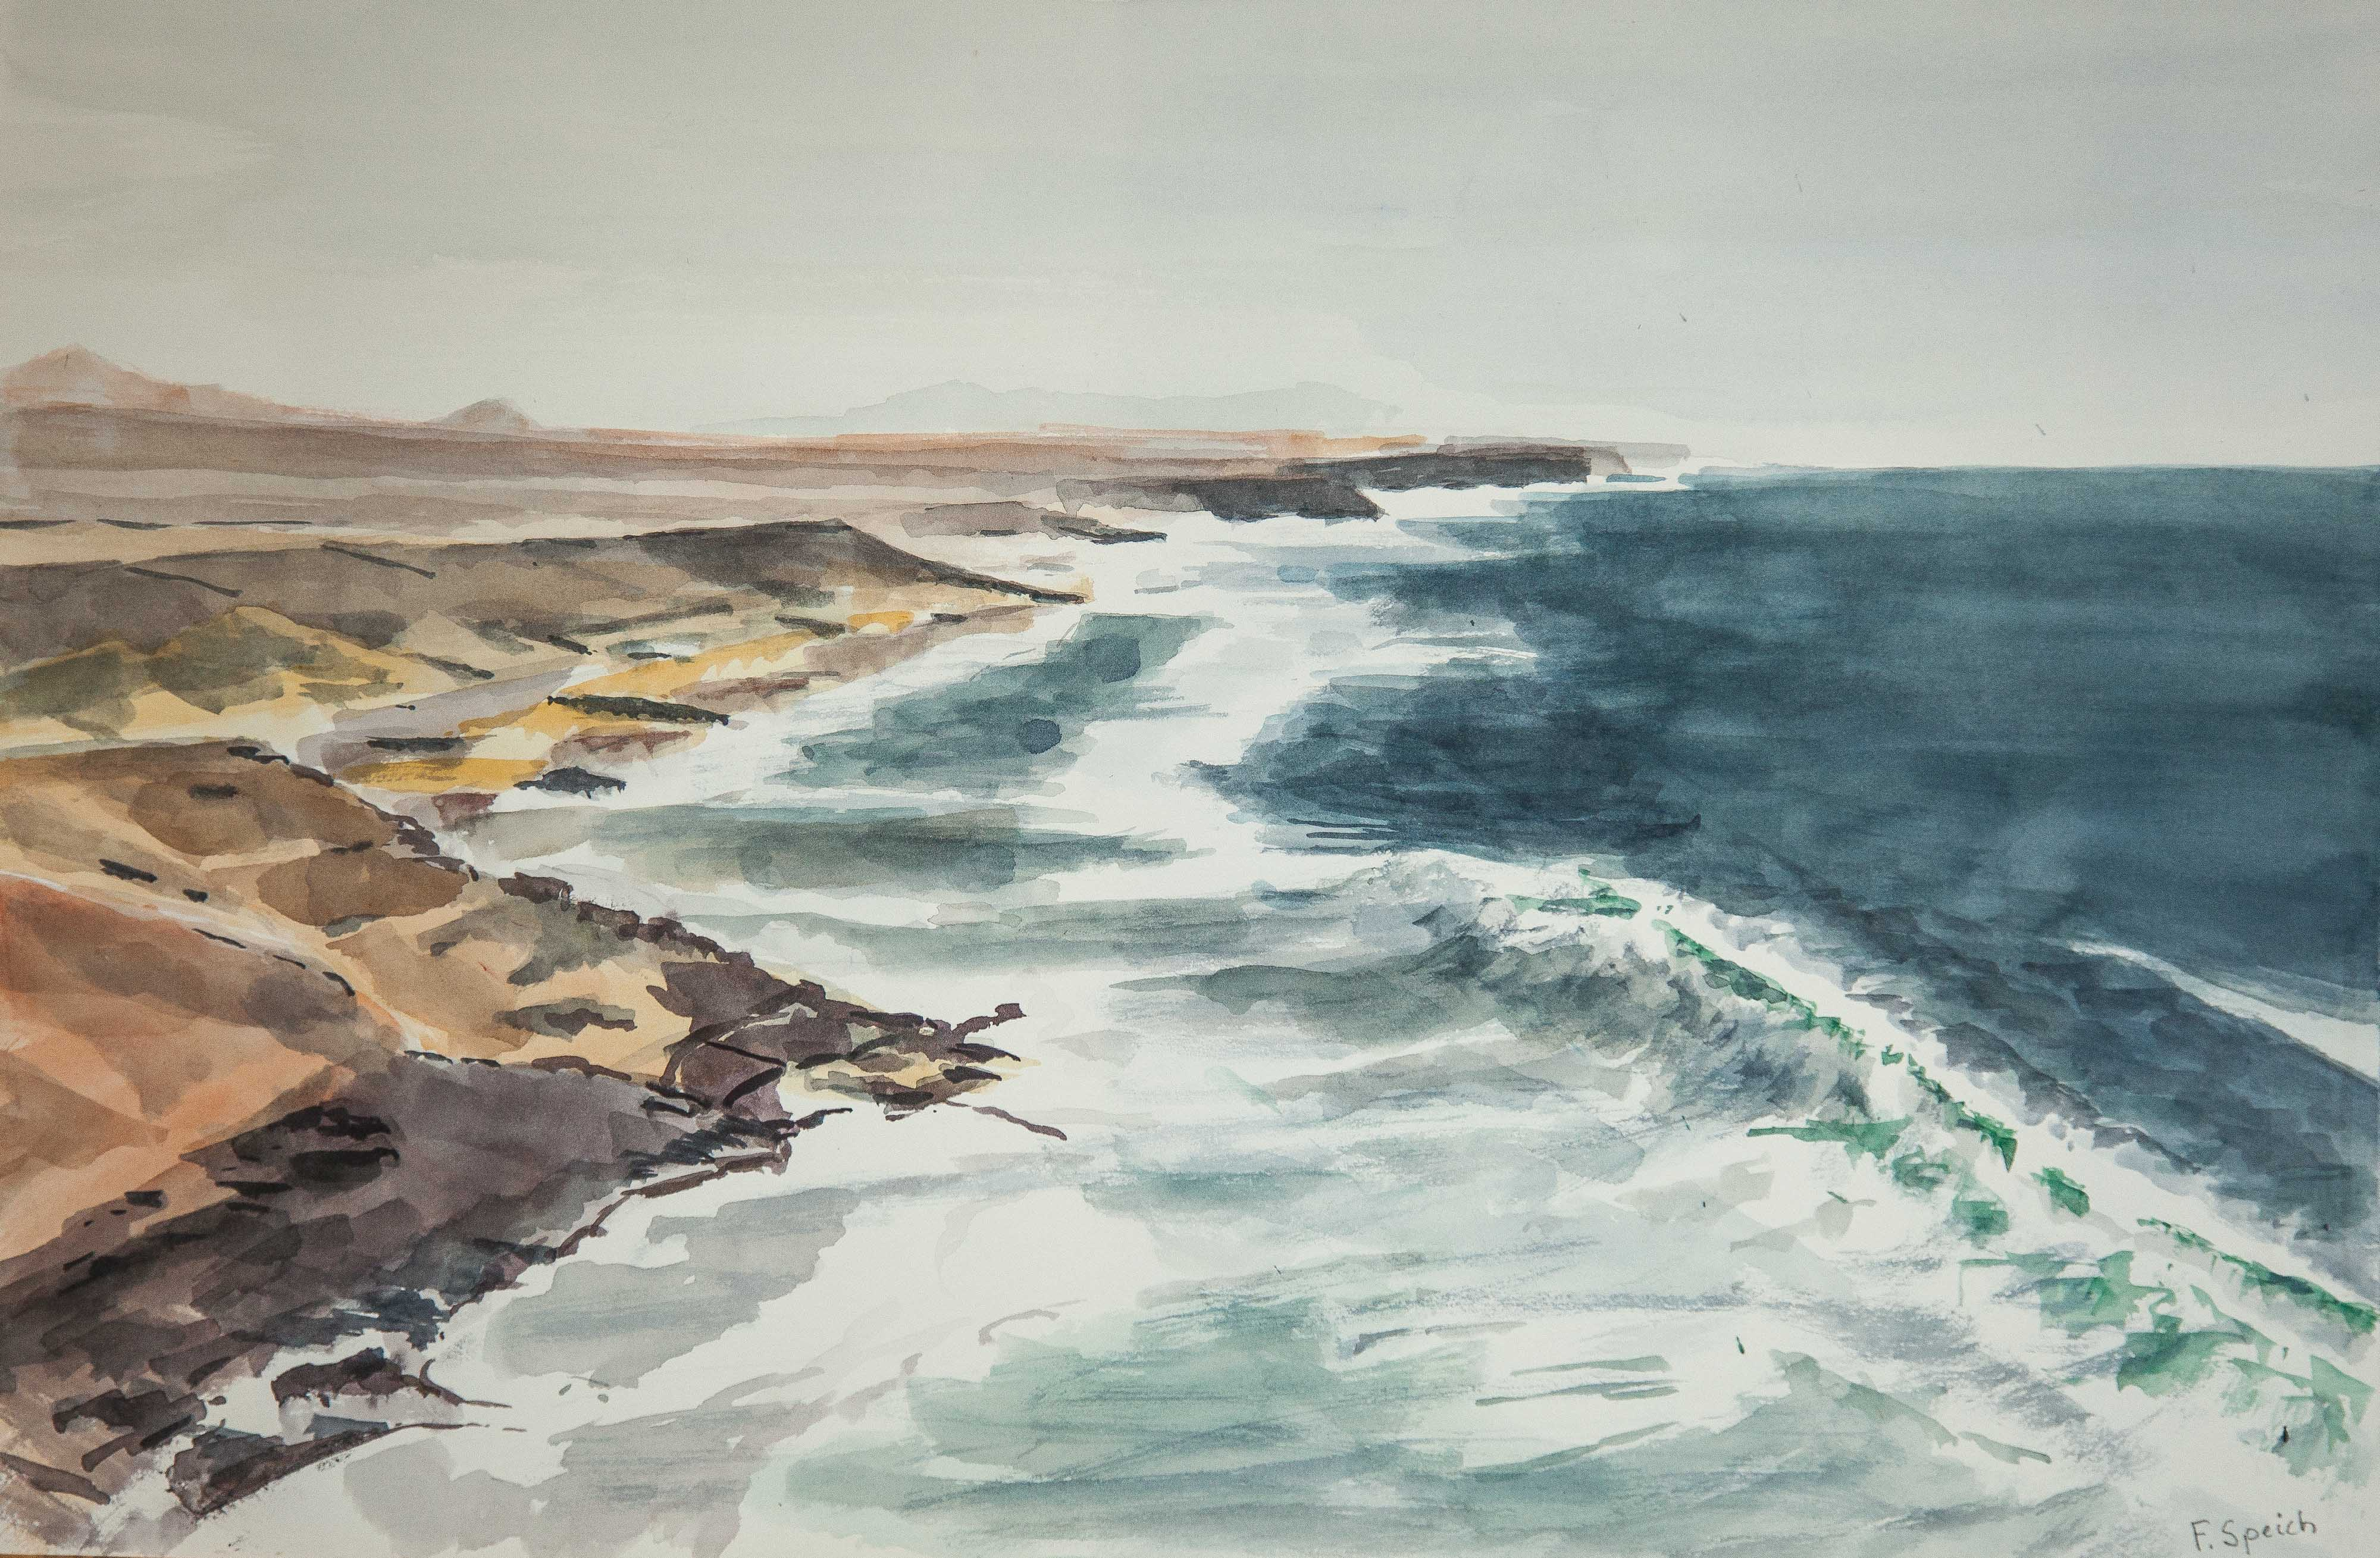 Fuerteventura-31